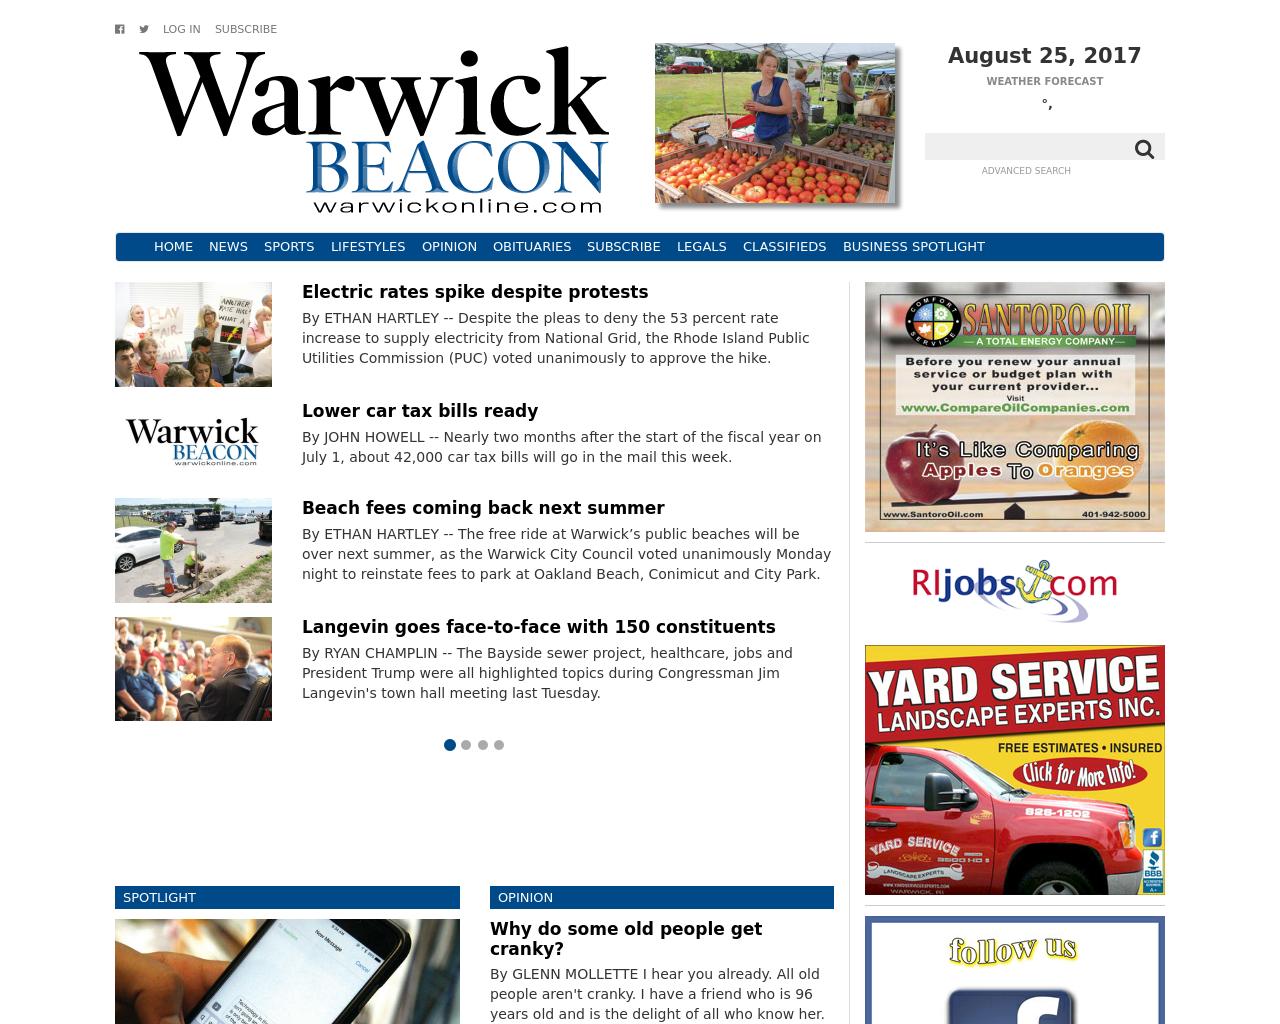 Warwick-Beacon-Advertising-Reviews-Pricing